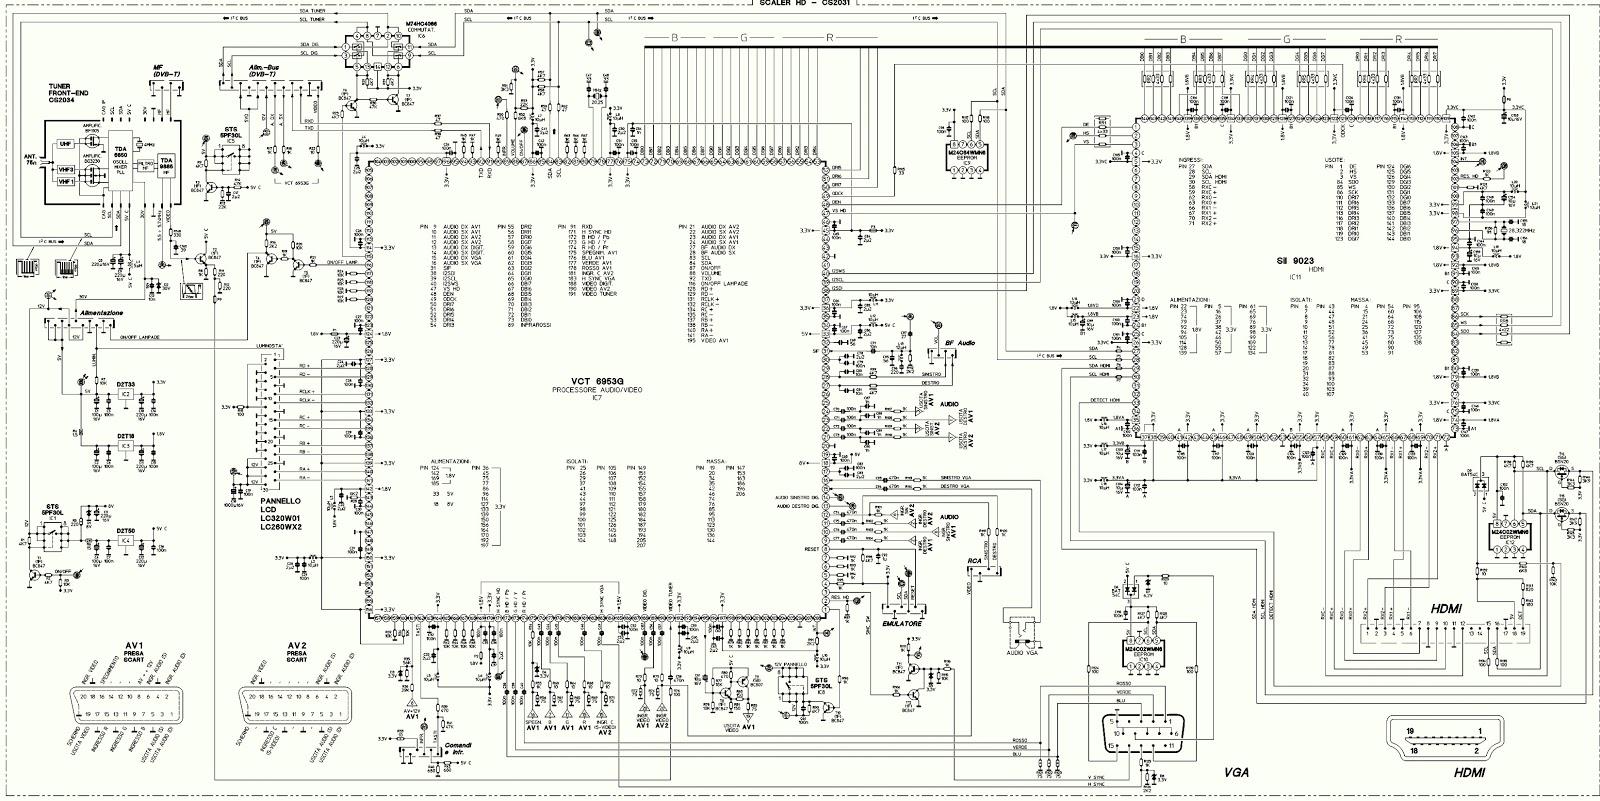 t con board block diagram